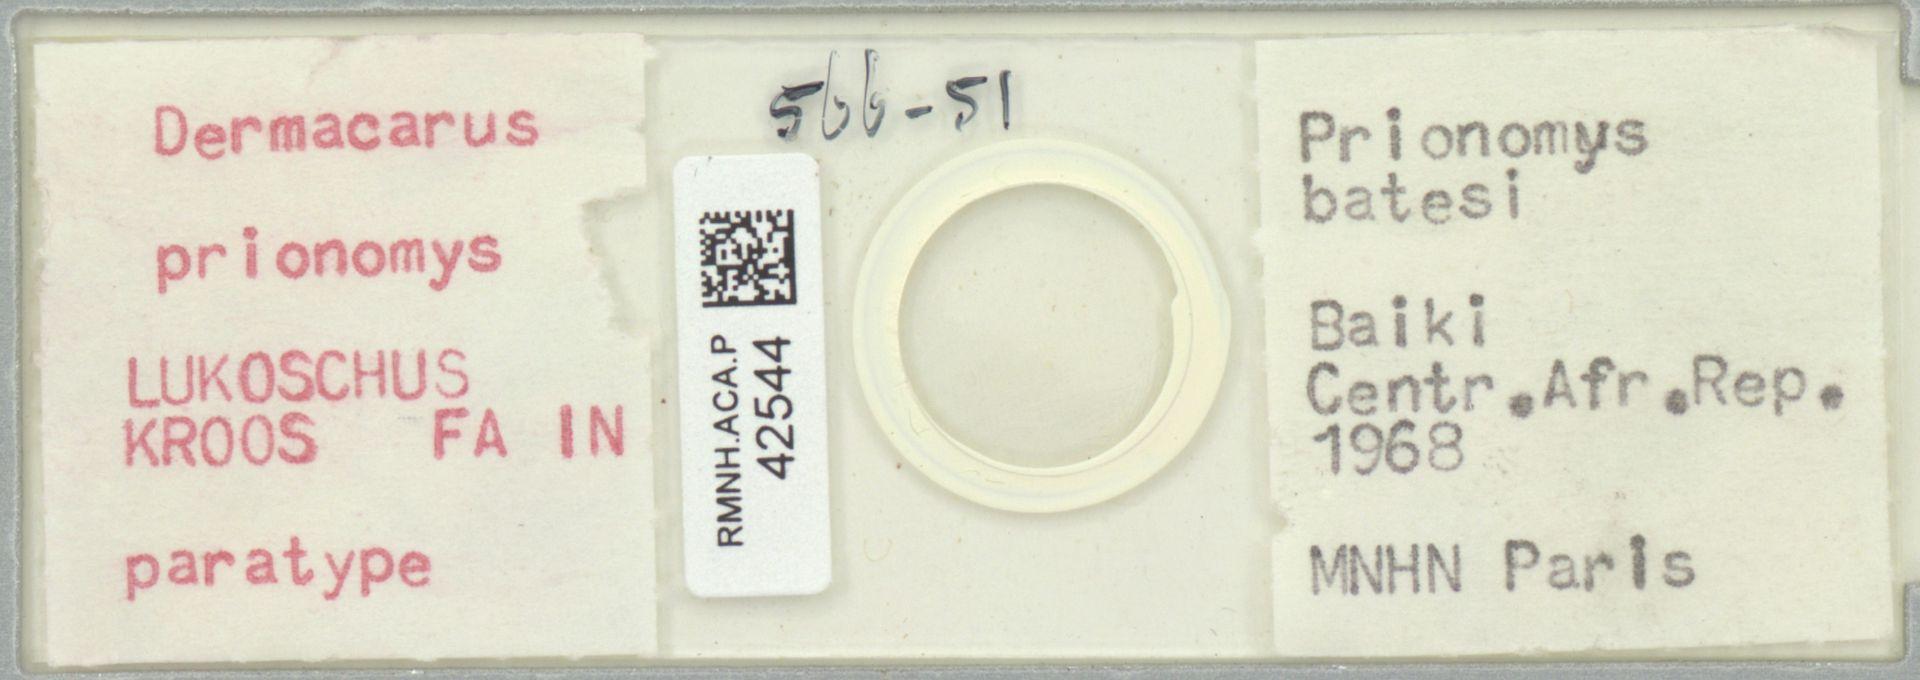 RMNH.ACA.P.42544 | Dermacarus prionomys Lukoschus Kroos Fain